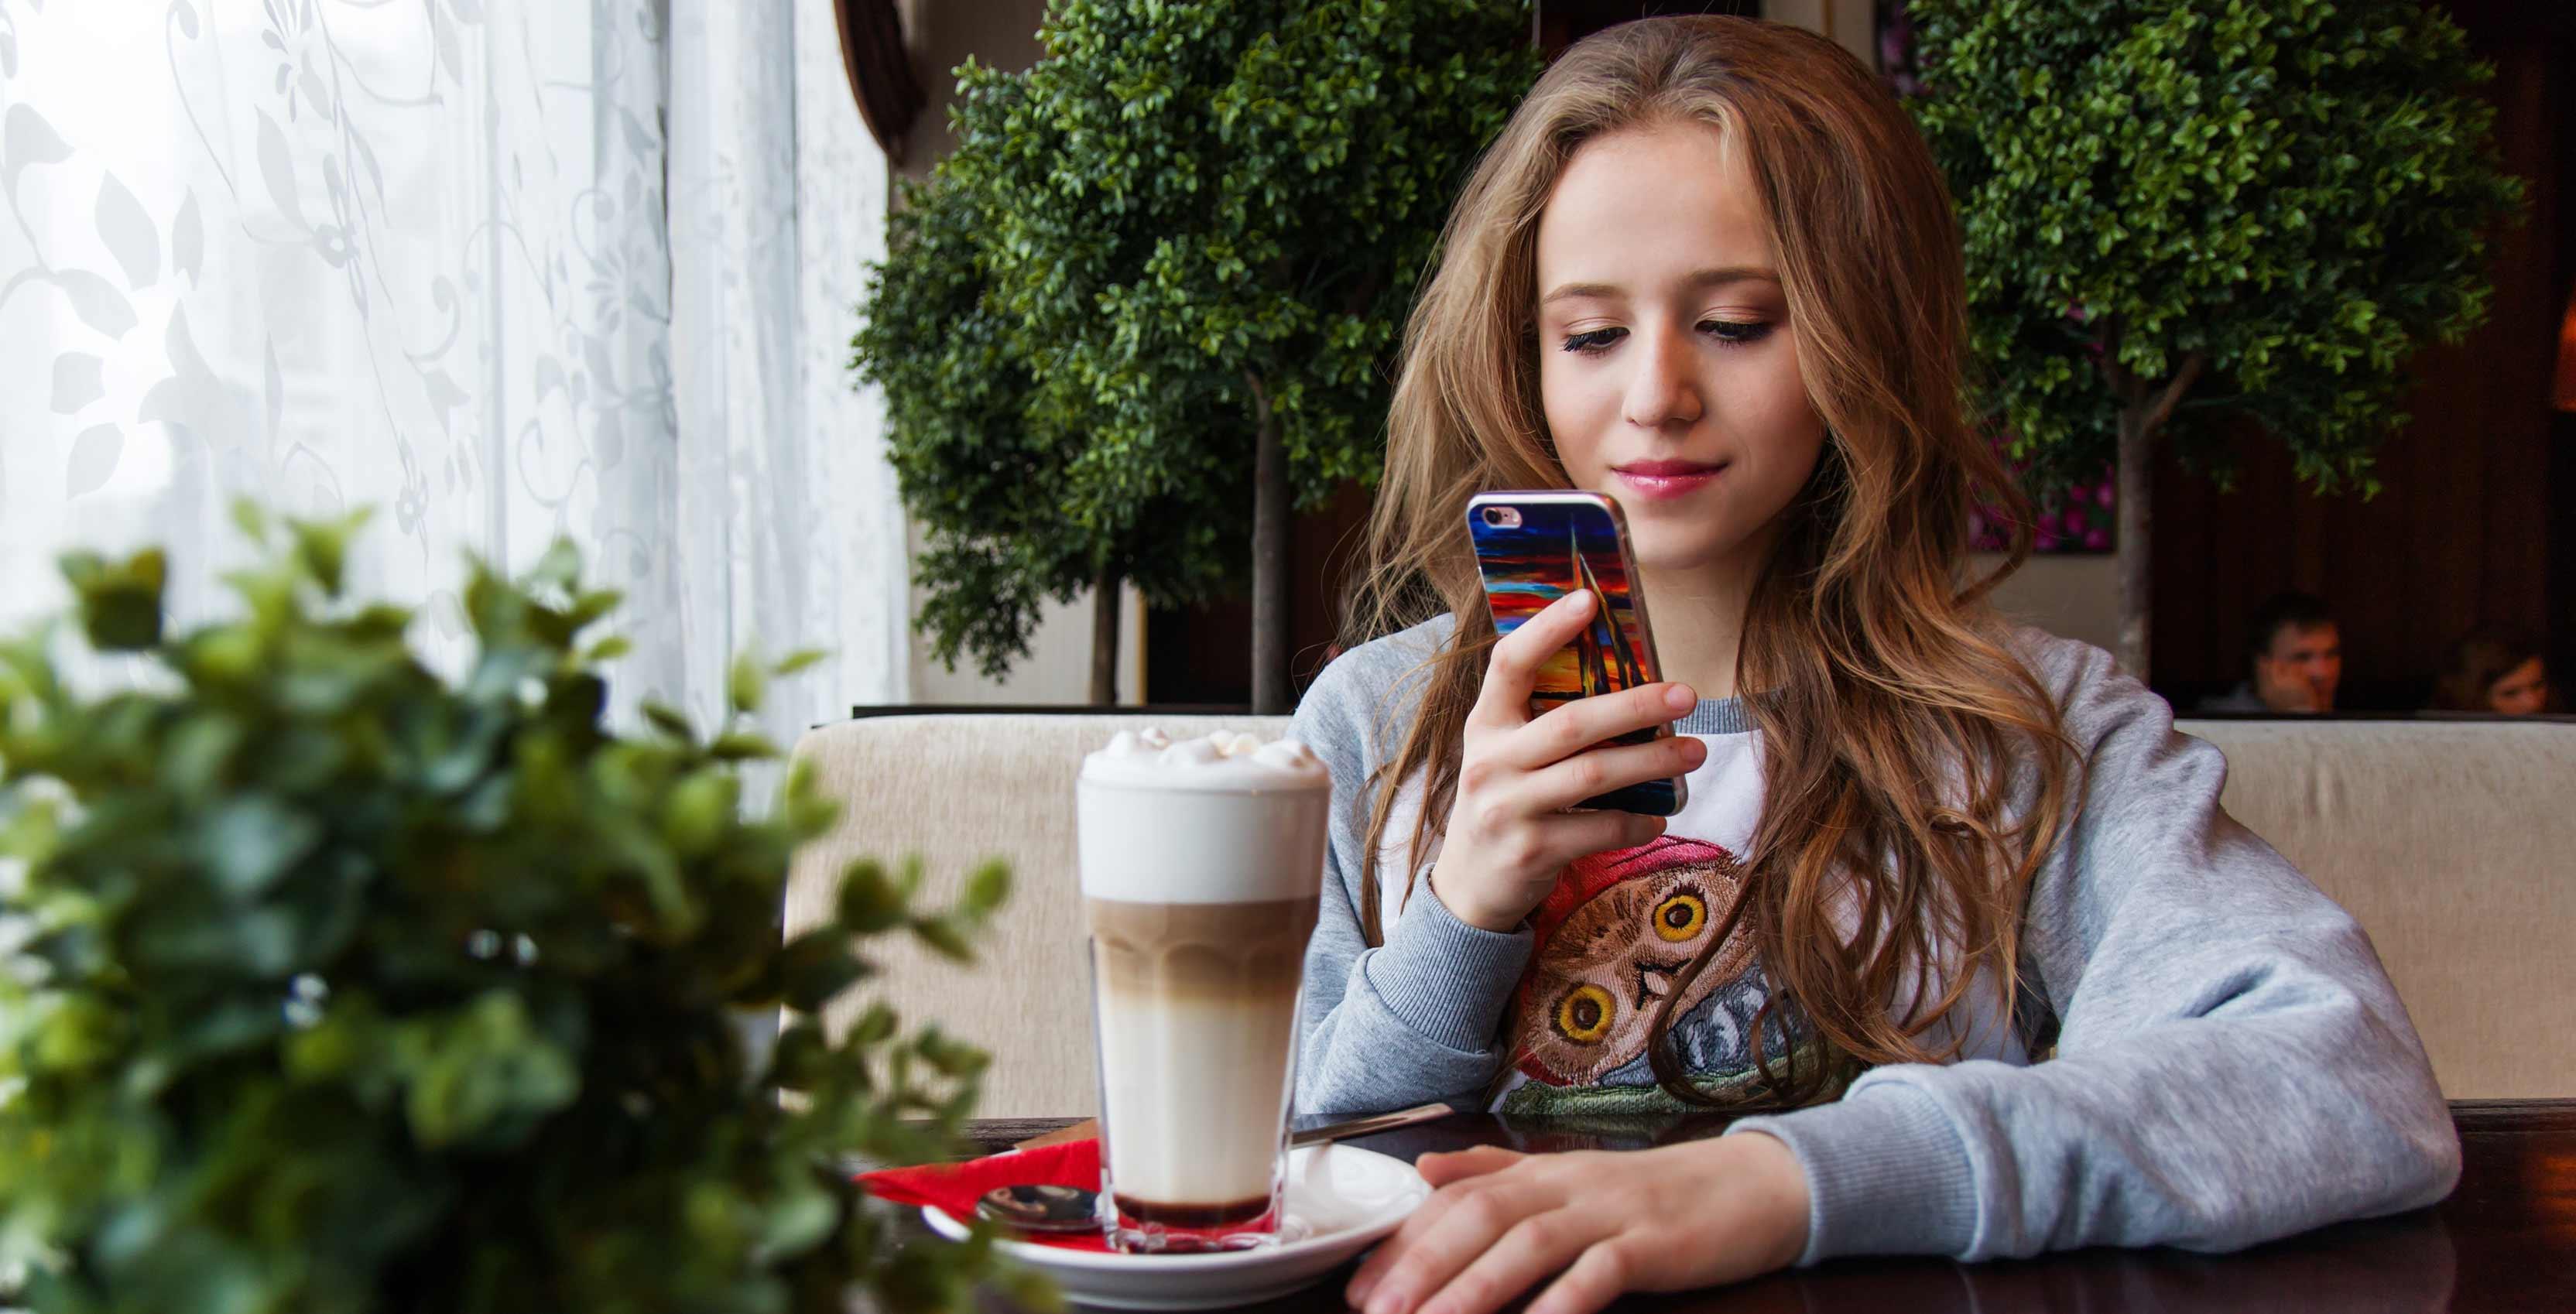 woman using phone in restaurant